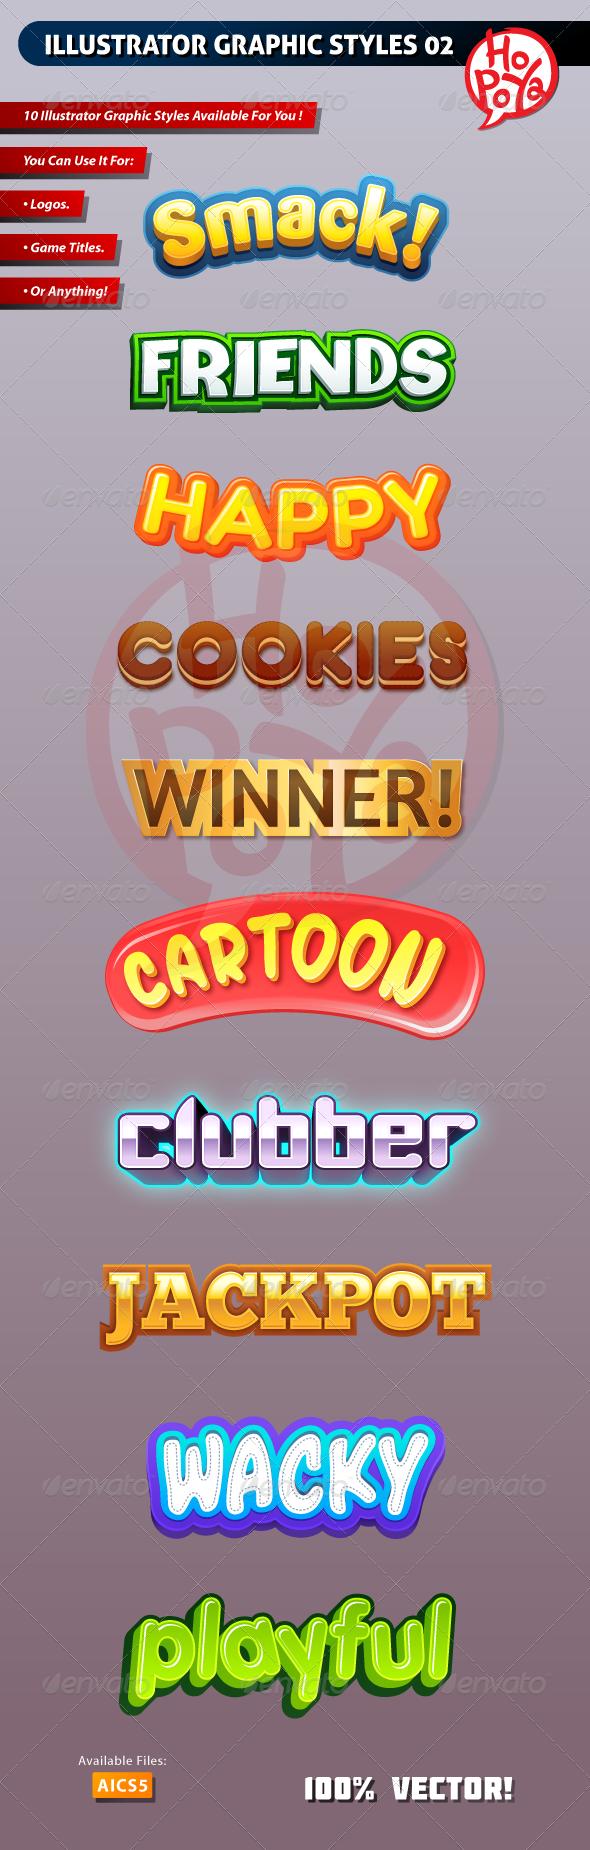 Illustrator Graphic Styles 02 - Styles Illustrator